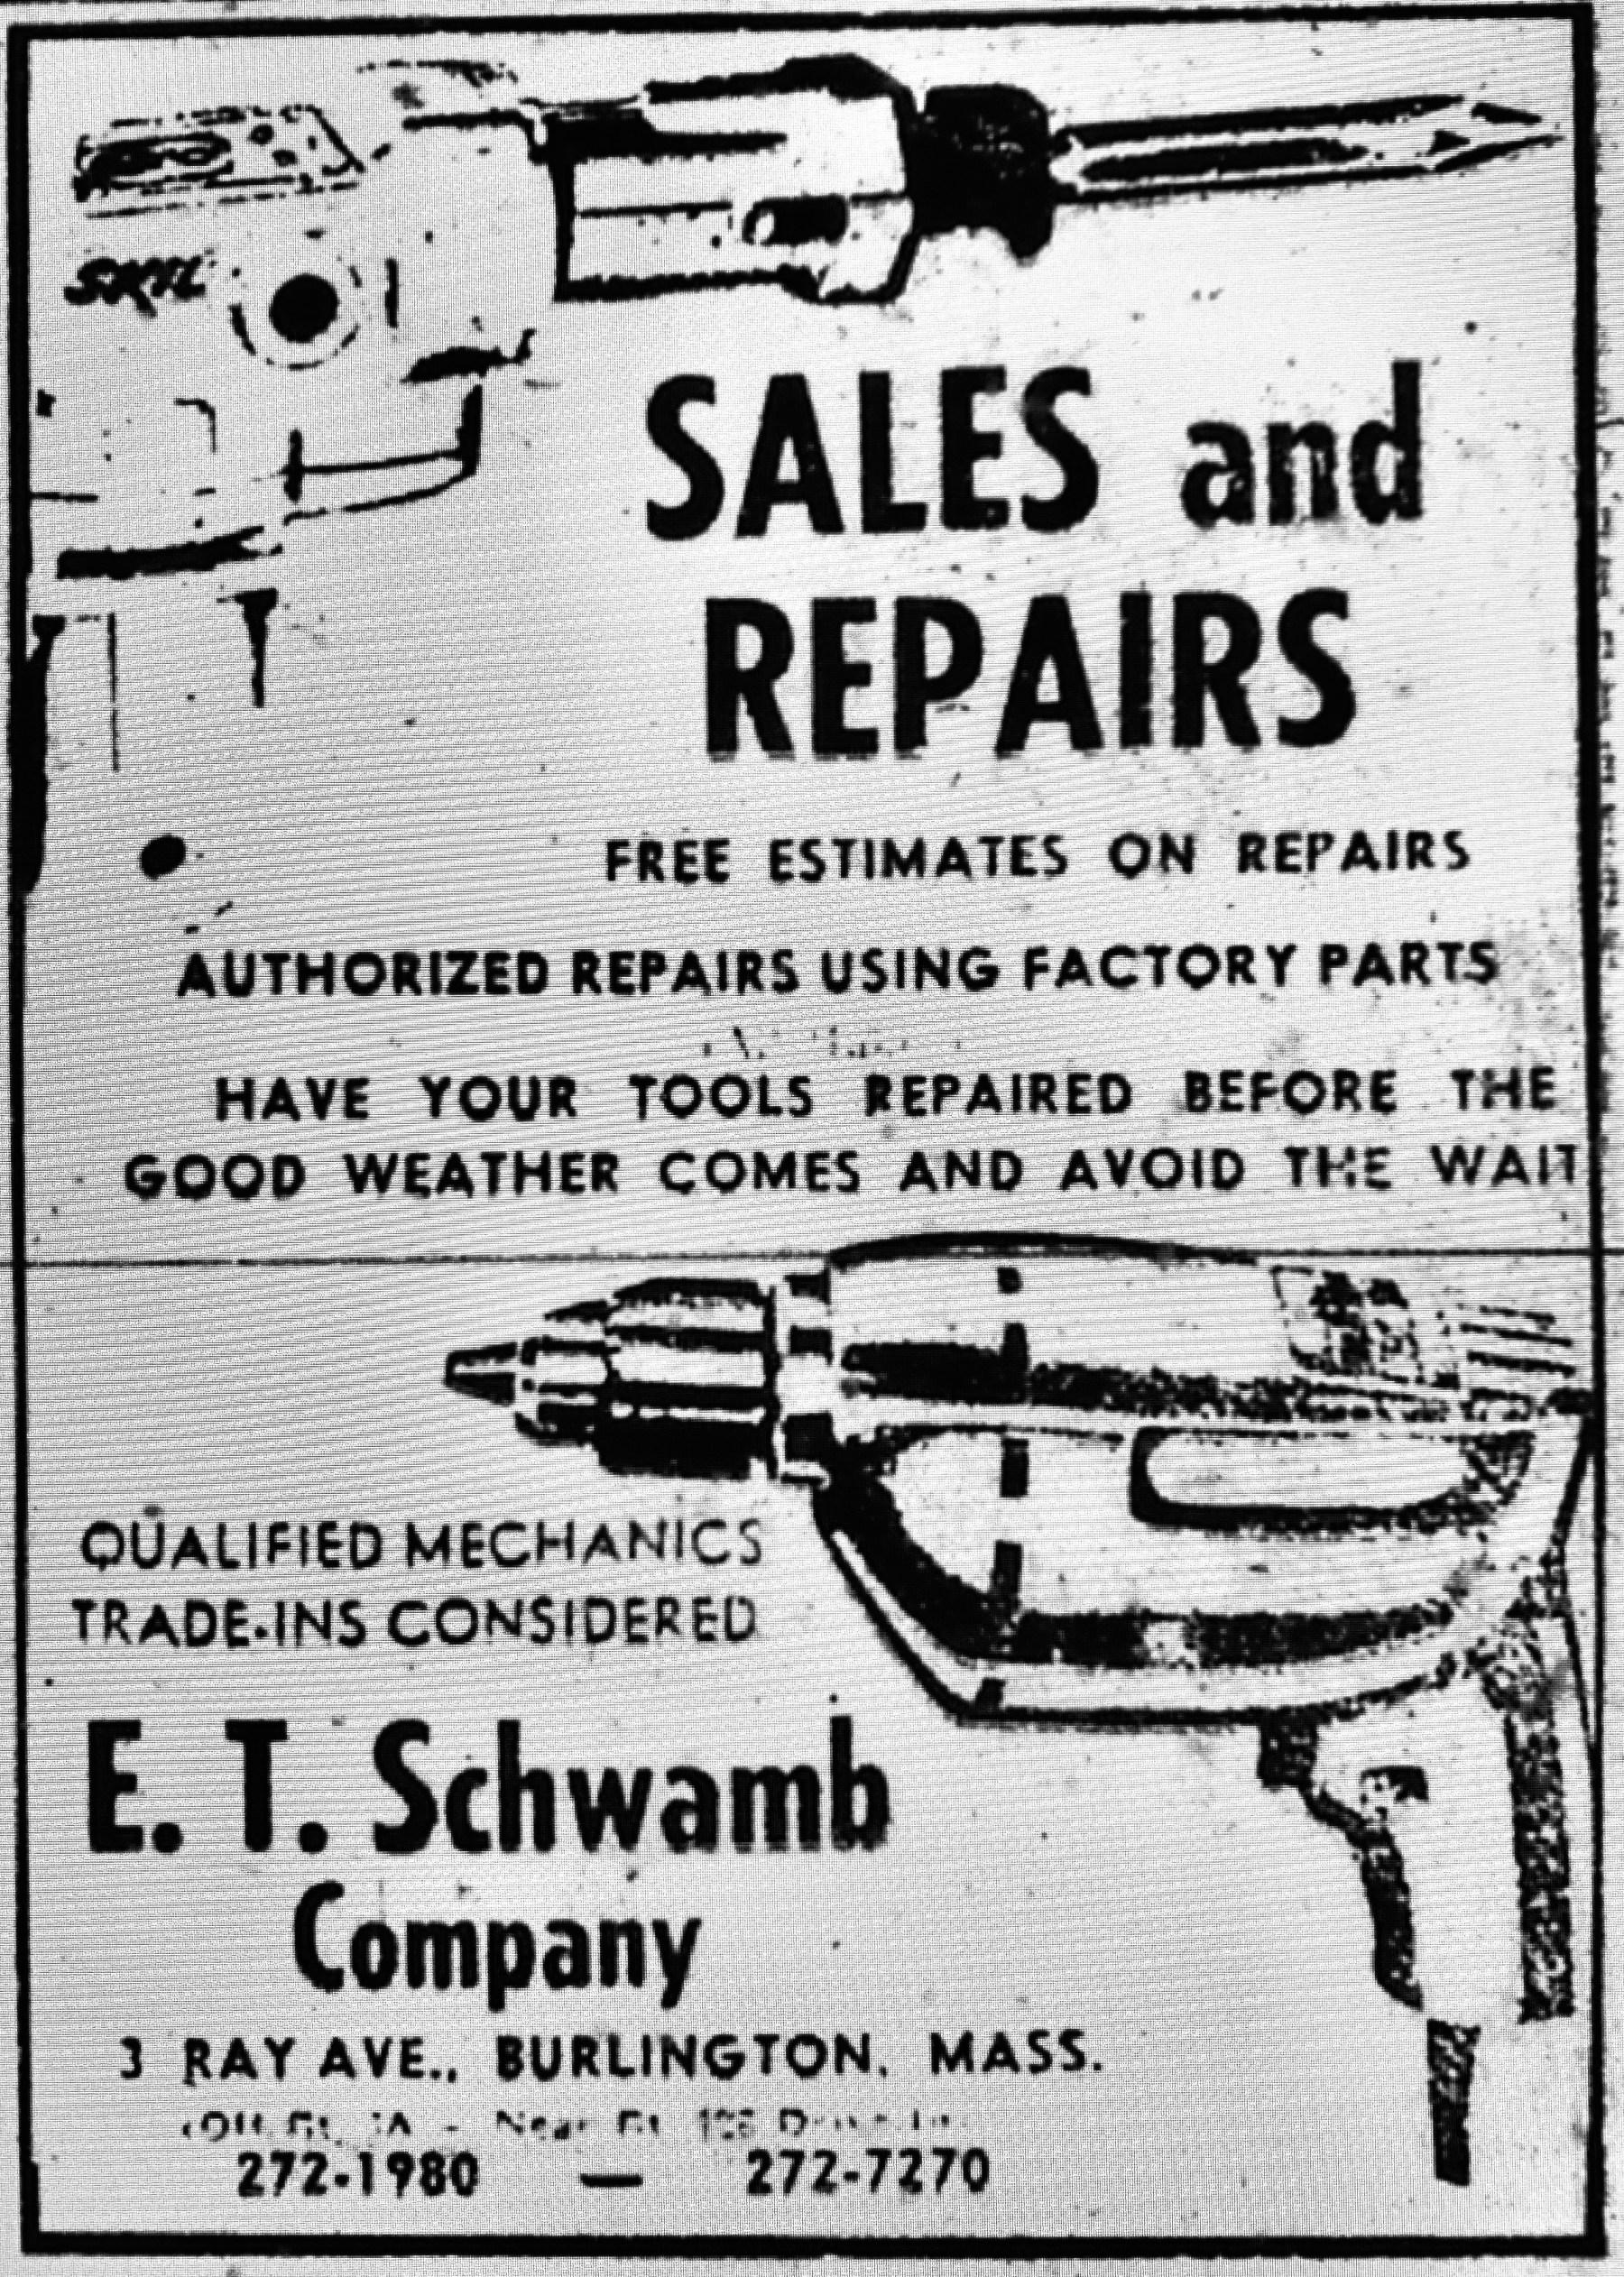 E.T. Schwamb Company Burlington MA